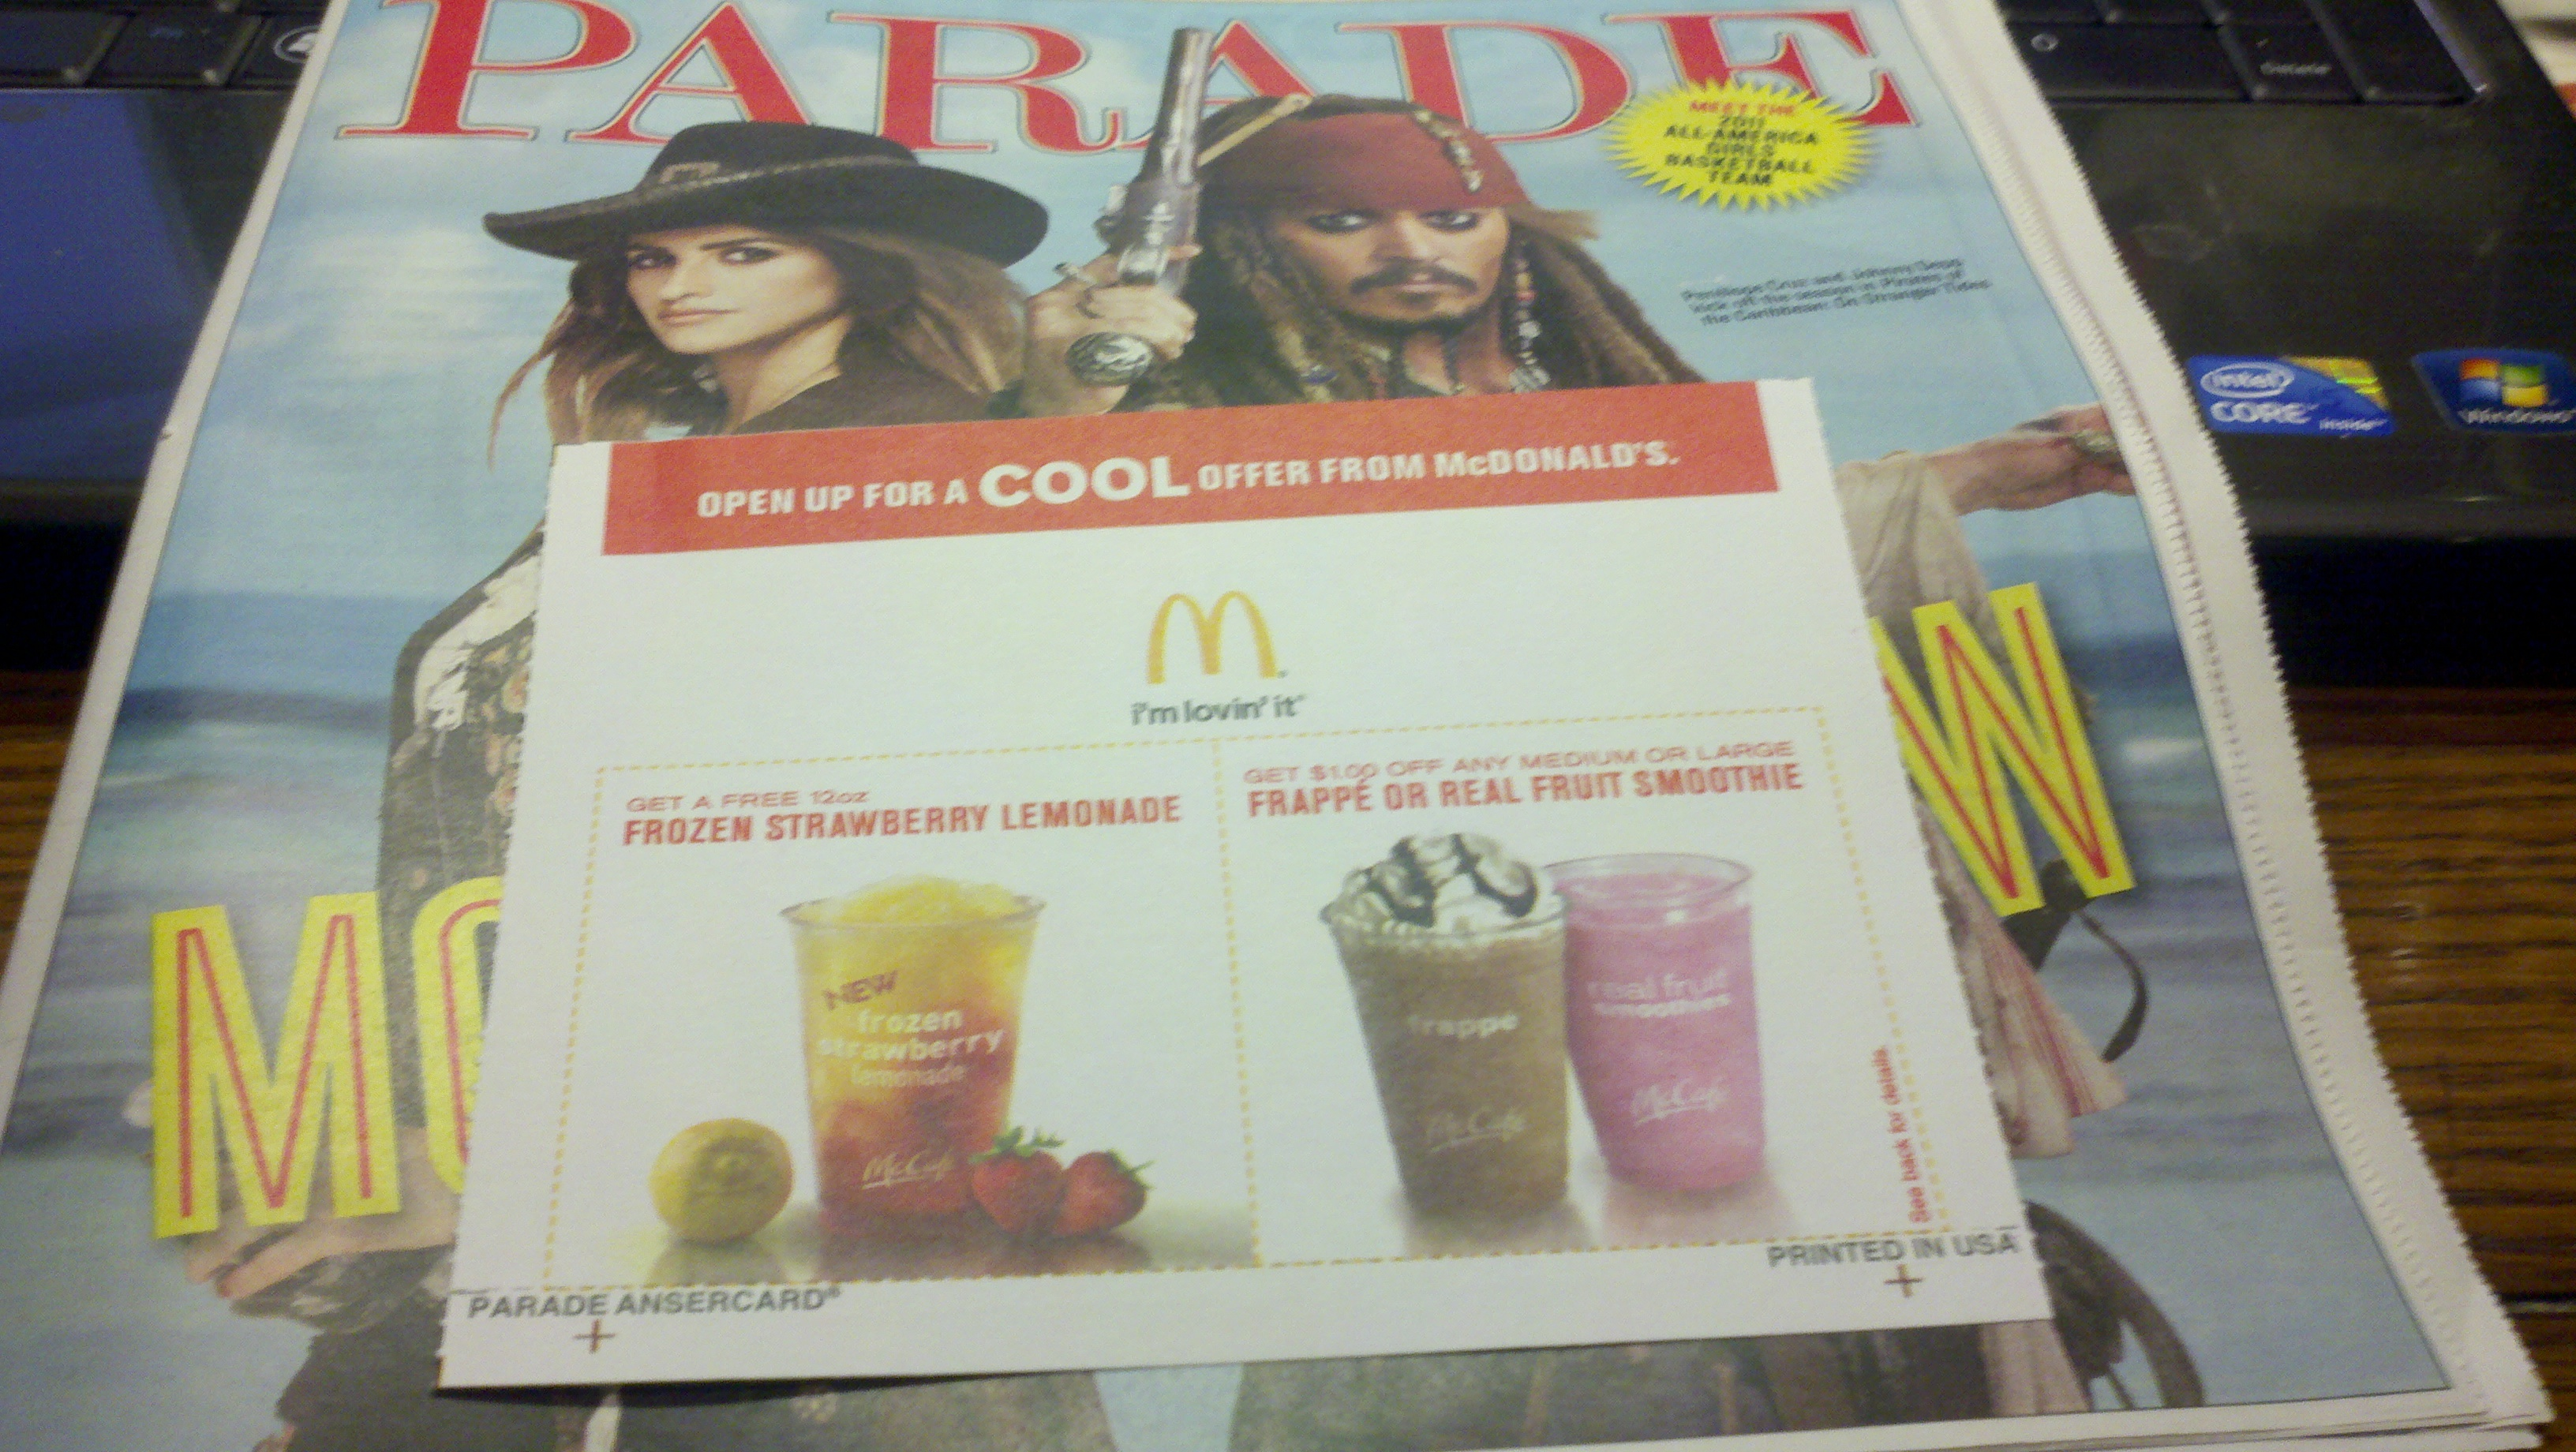 Free Mcdonald's Frozen Strawberry Lemonade Coupon In The Parade - Free Mcdonalds Smoothie Printable Coupon